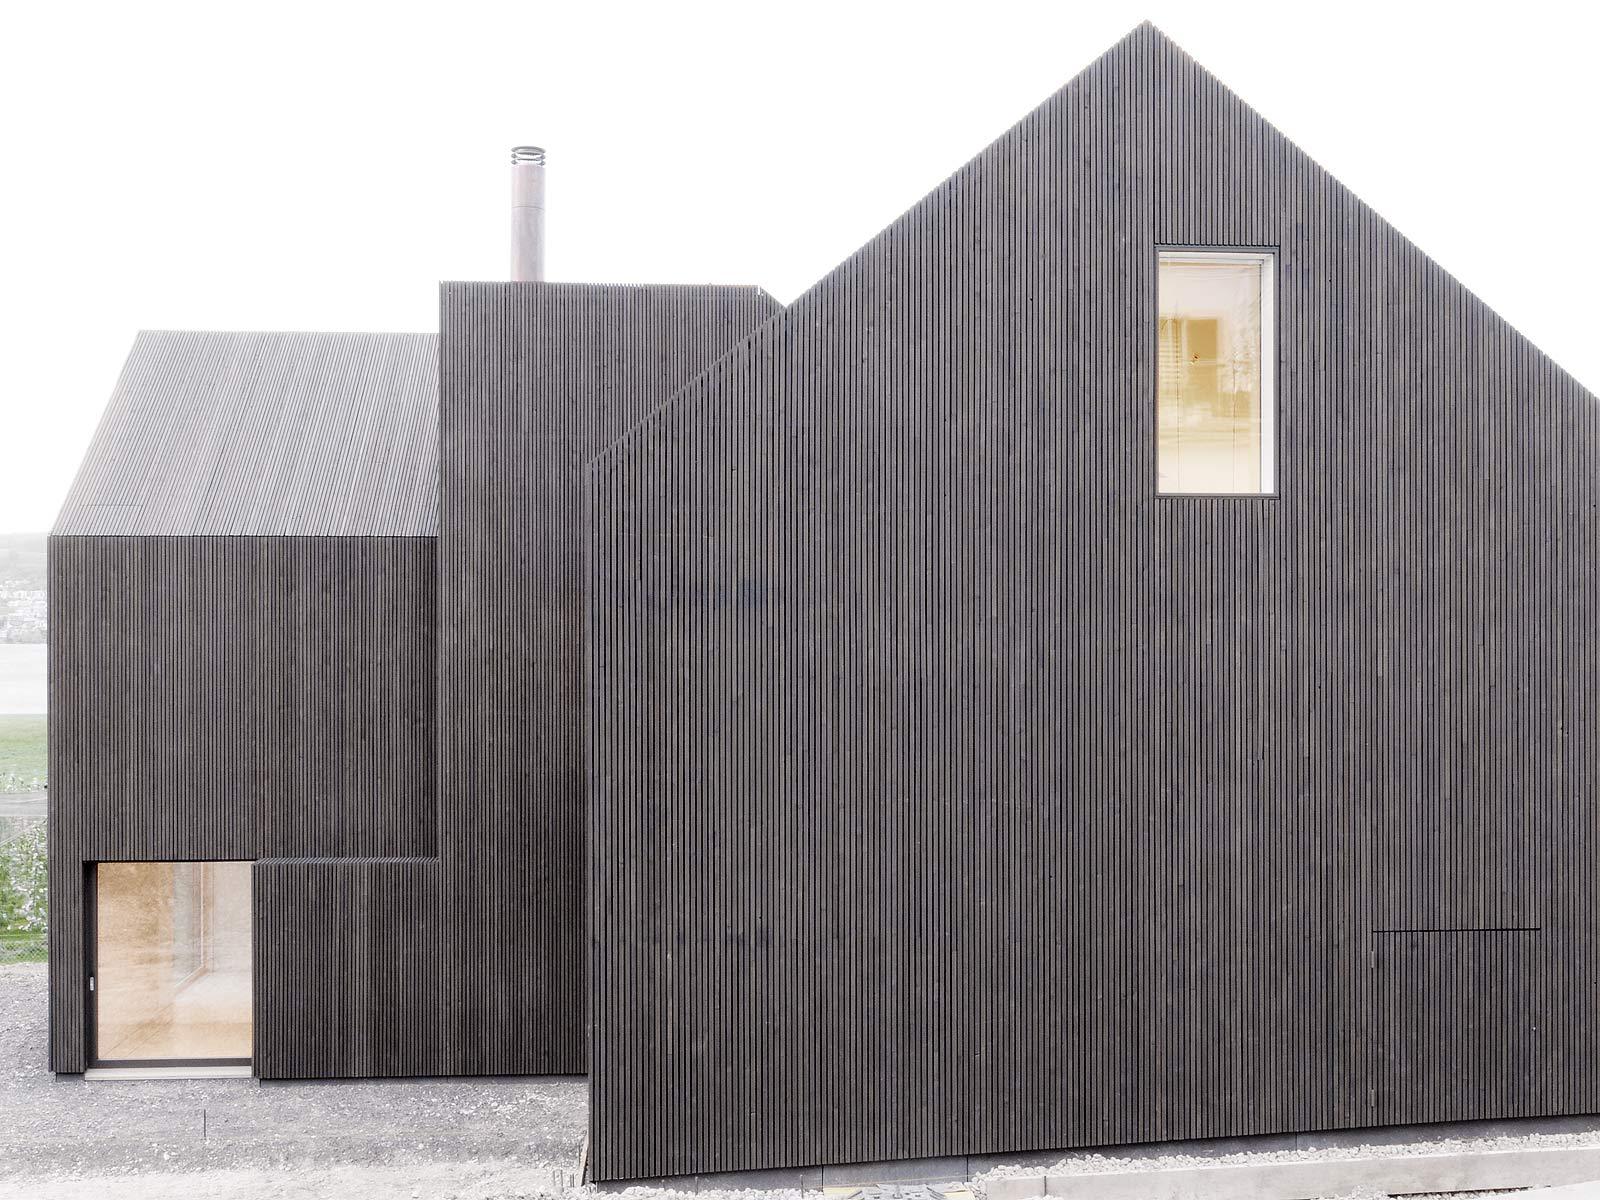 best architects architektur award rossetti wyss architekten rossetti wyss architekten. Black Bedroom Furniture Sets. Home Design Ideas